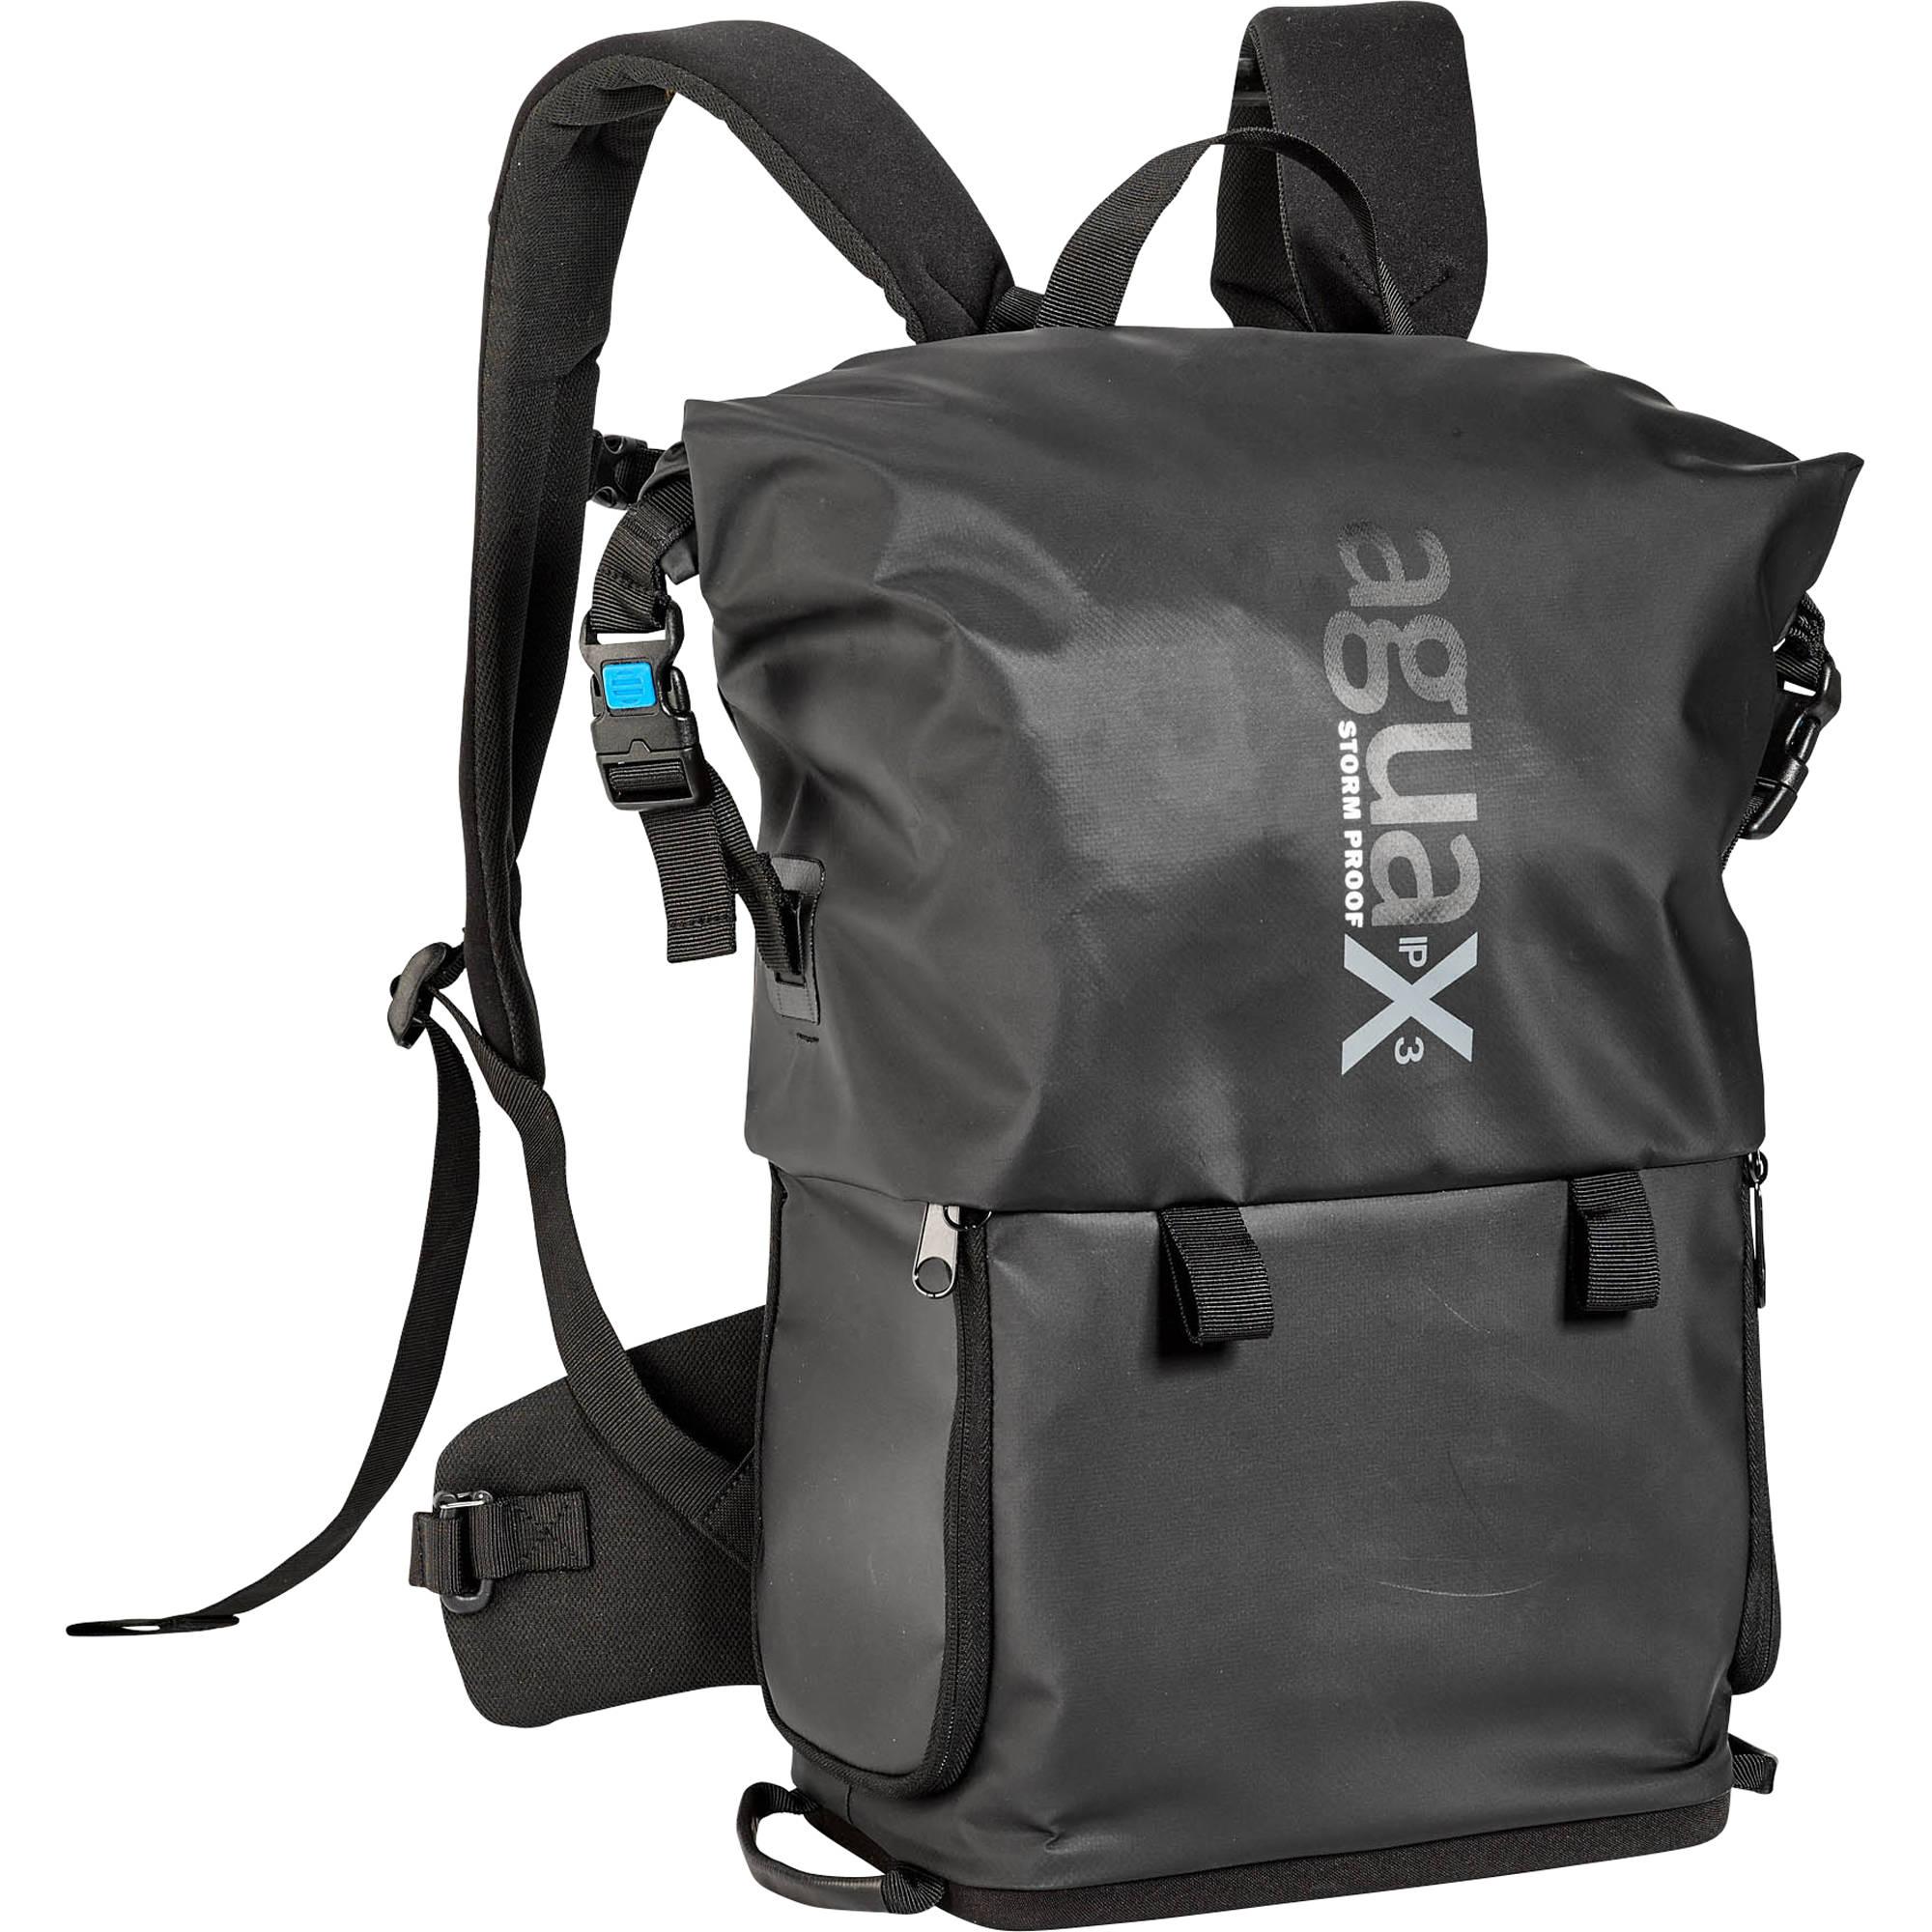 miggo  Agua Stormproof Backpack 85 (Black) $99.95 @ B&H Photo w/ Free Shipping